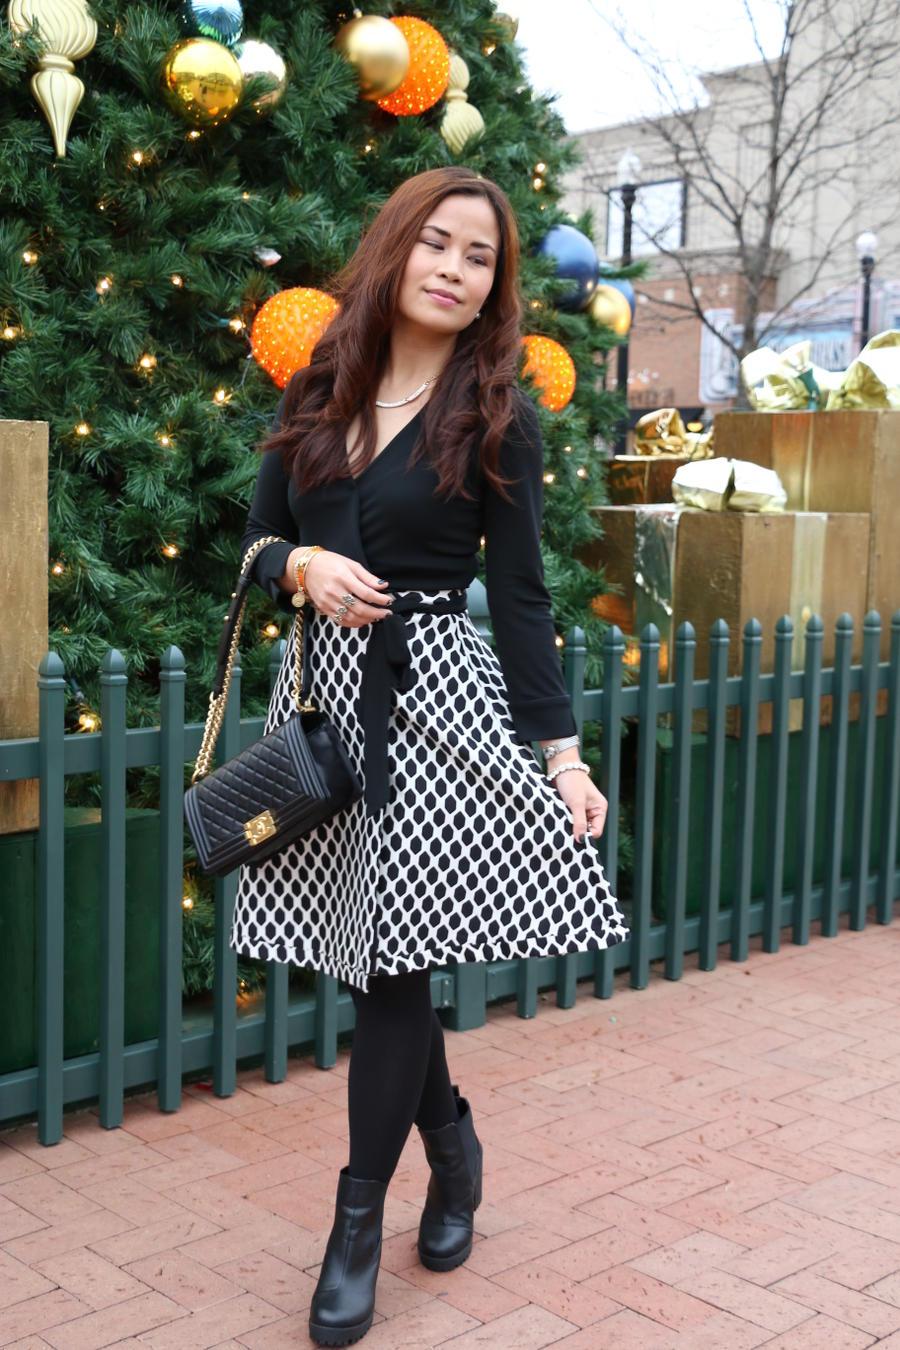 Christmas Outfit, DVF, Diane von Furstenberg wrap dress, fashion, style, styleanthropy